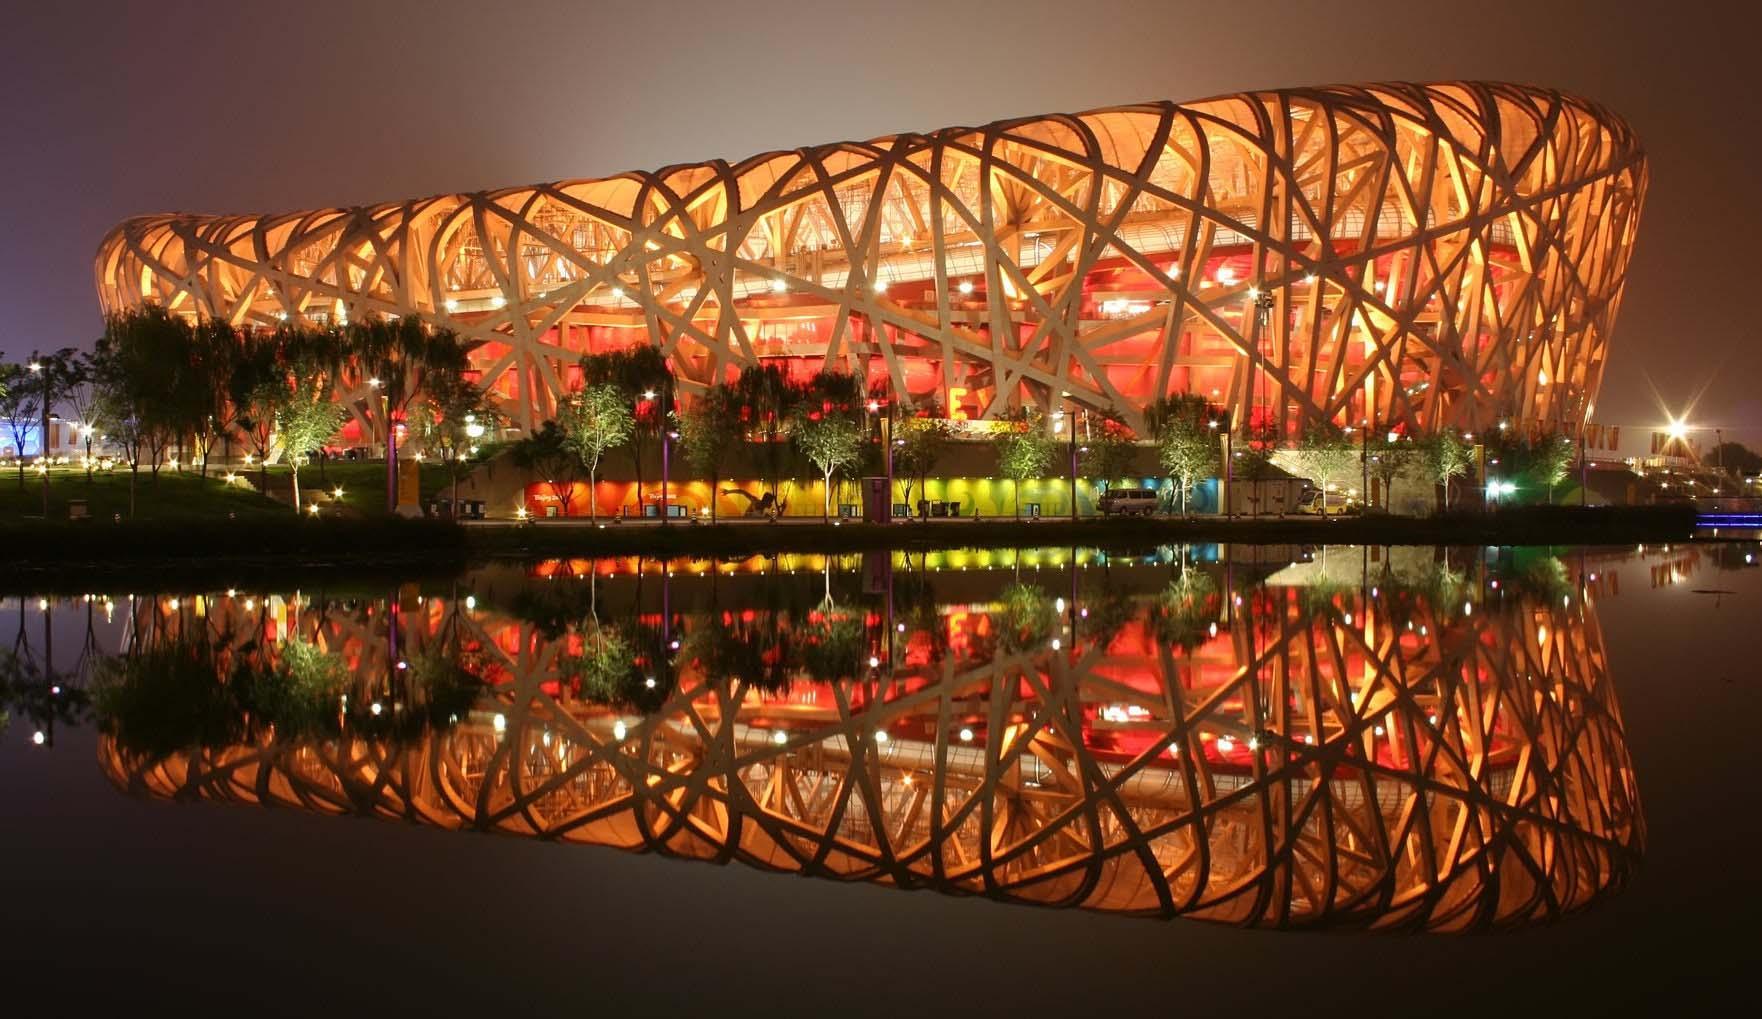 Beijing national stadium Bird's Nest during night